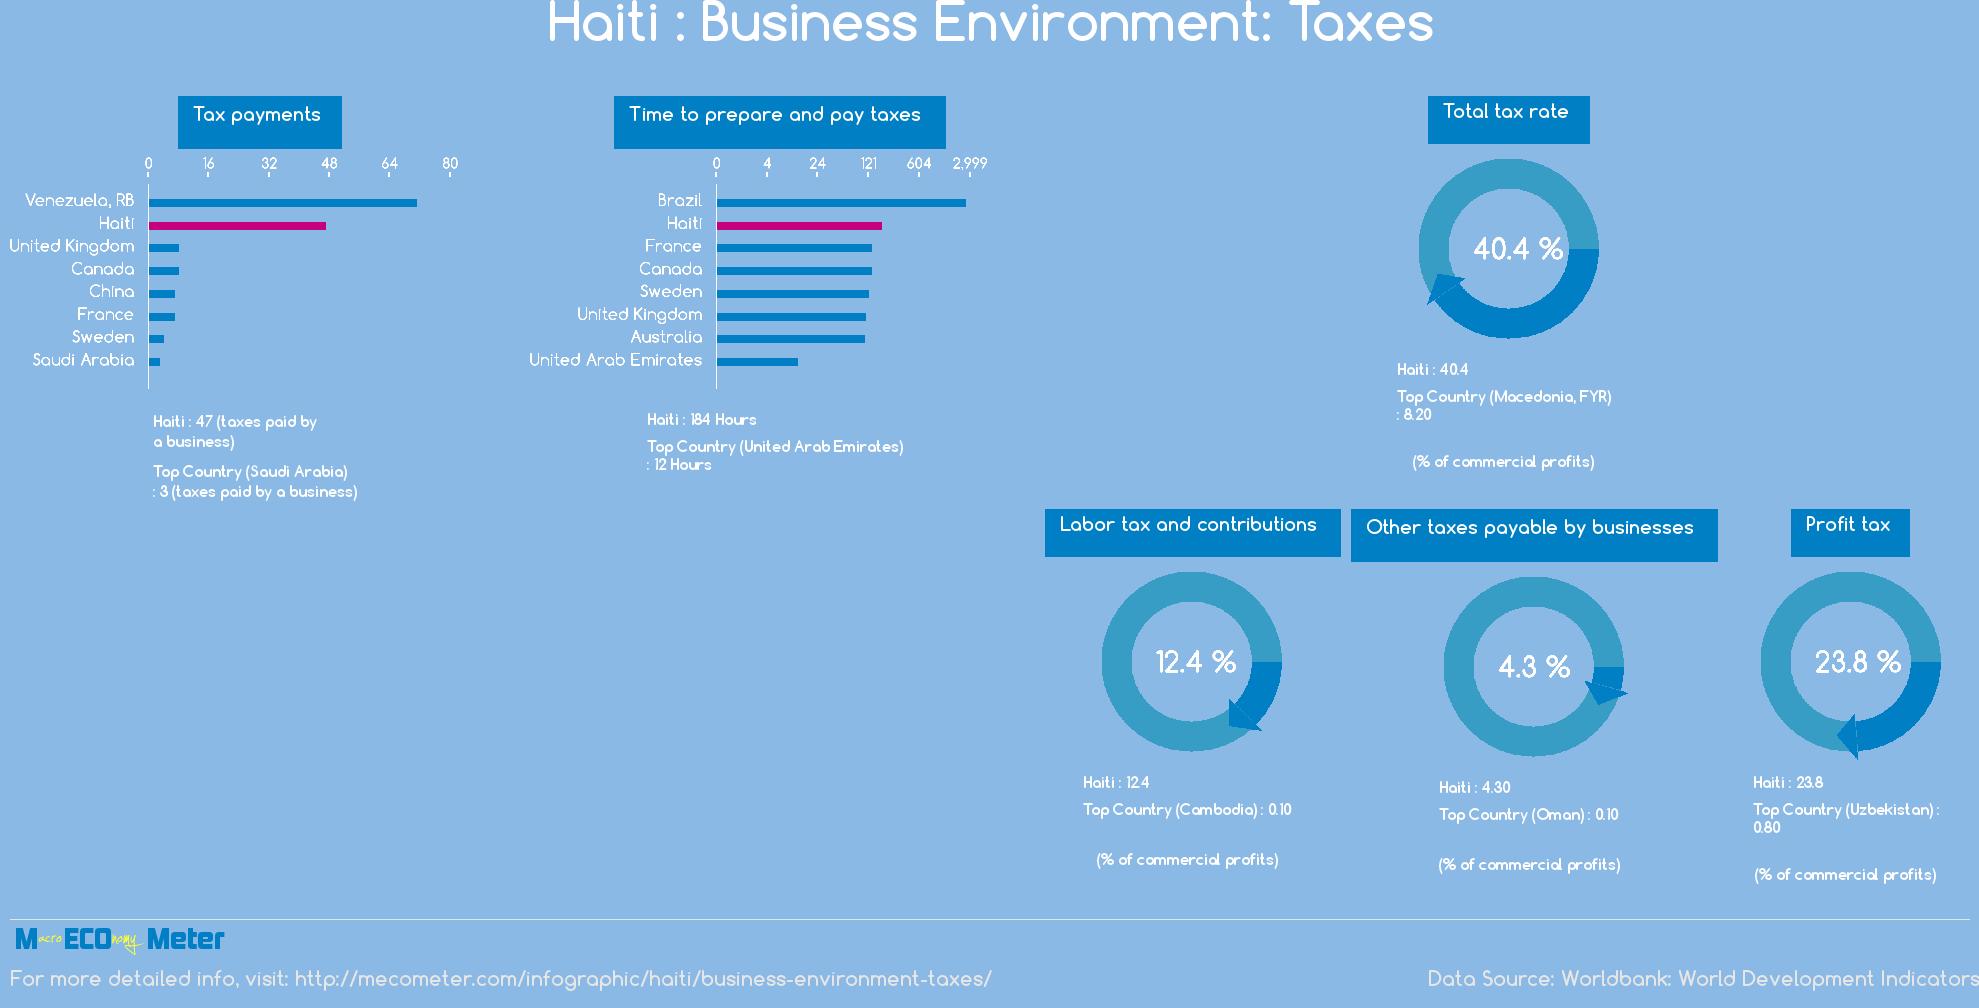 Haiti : Business Environment: Taxes